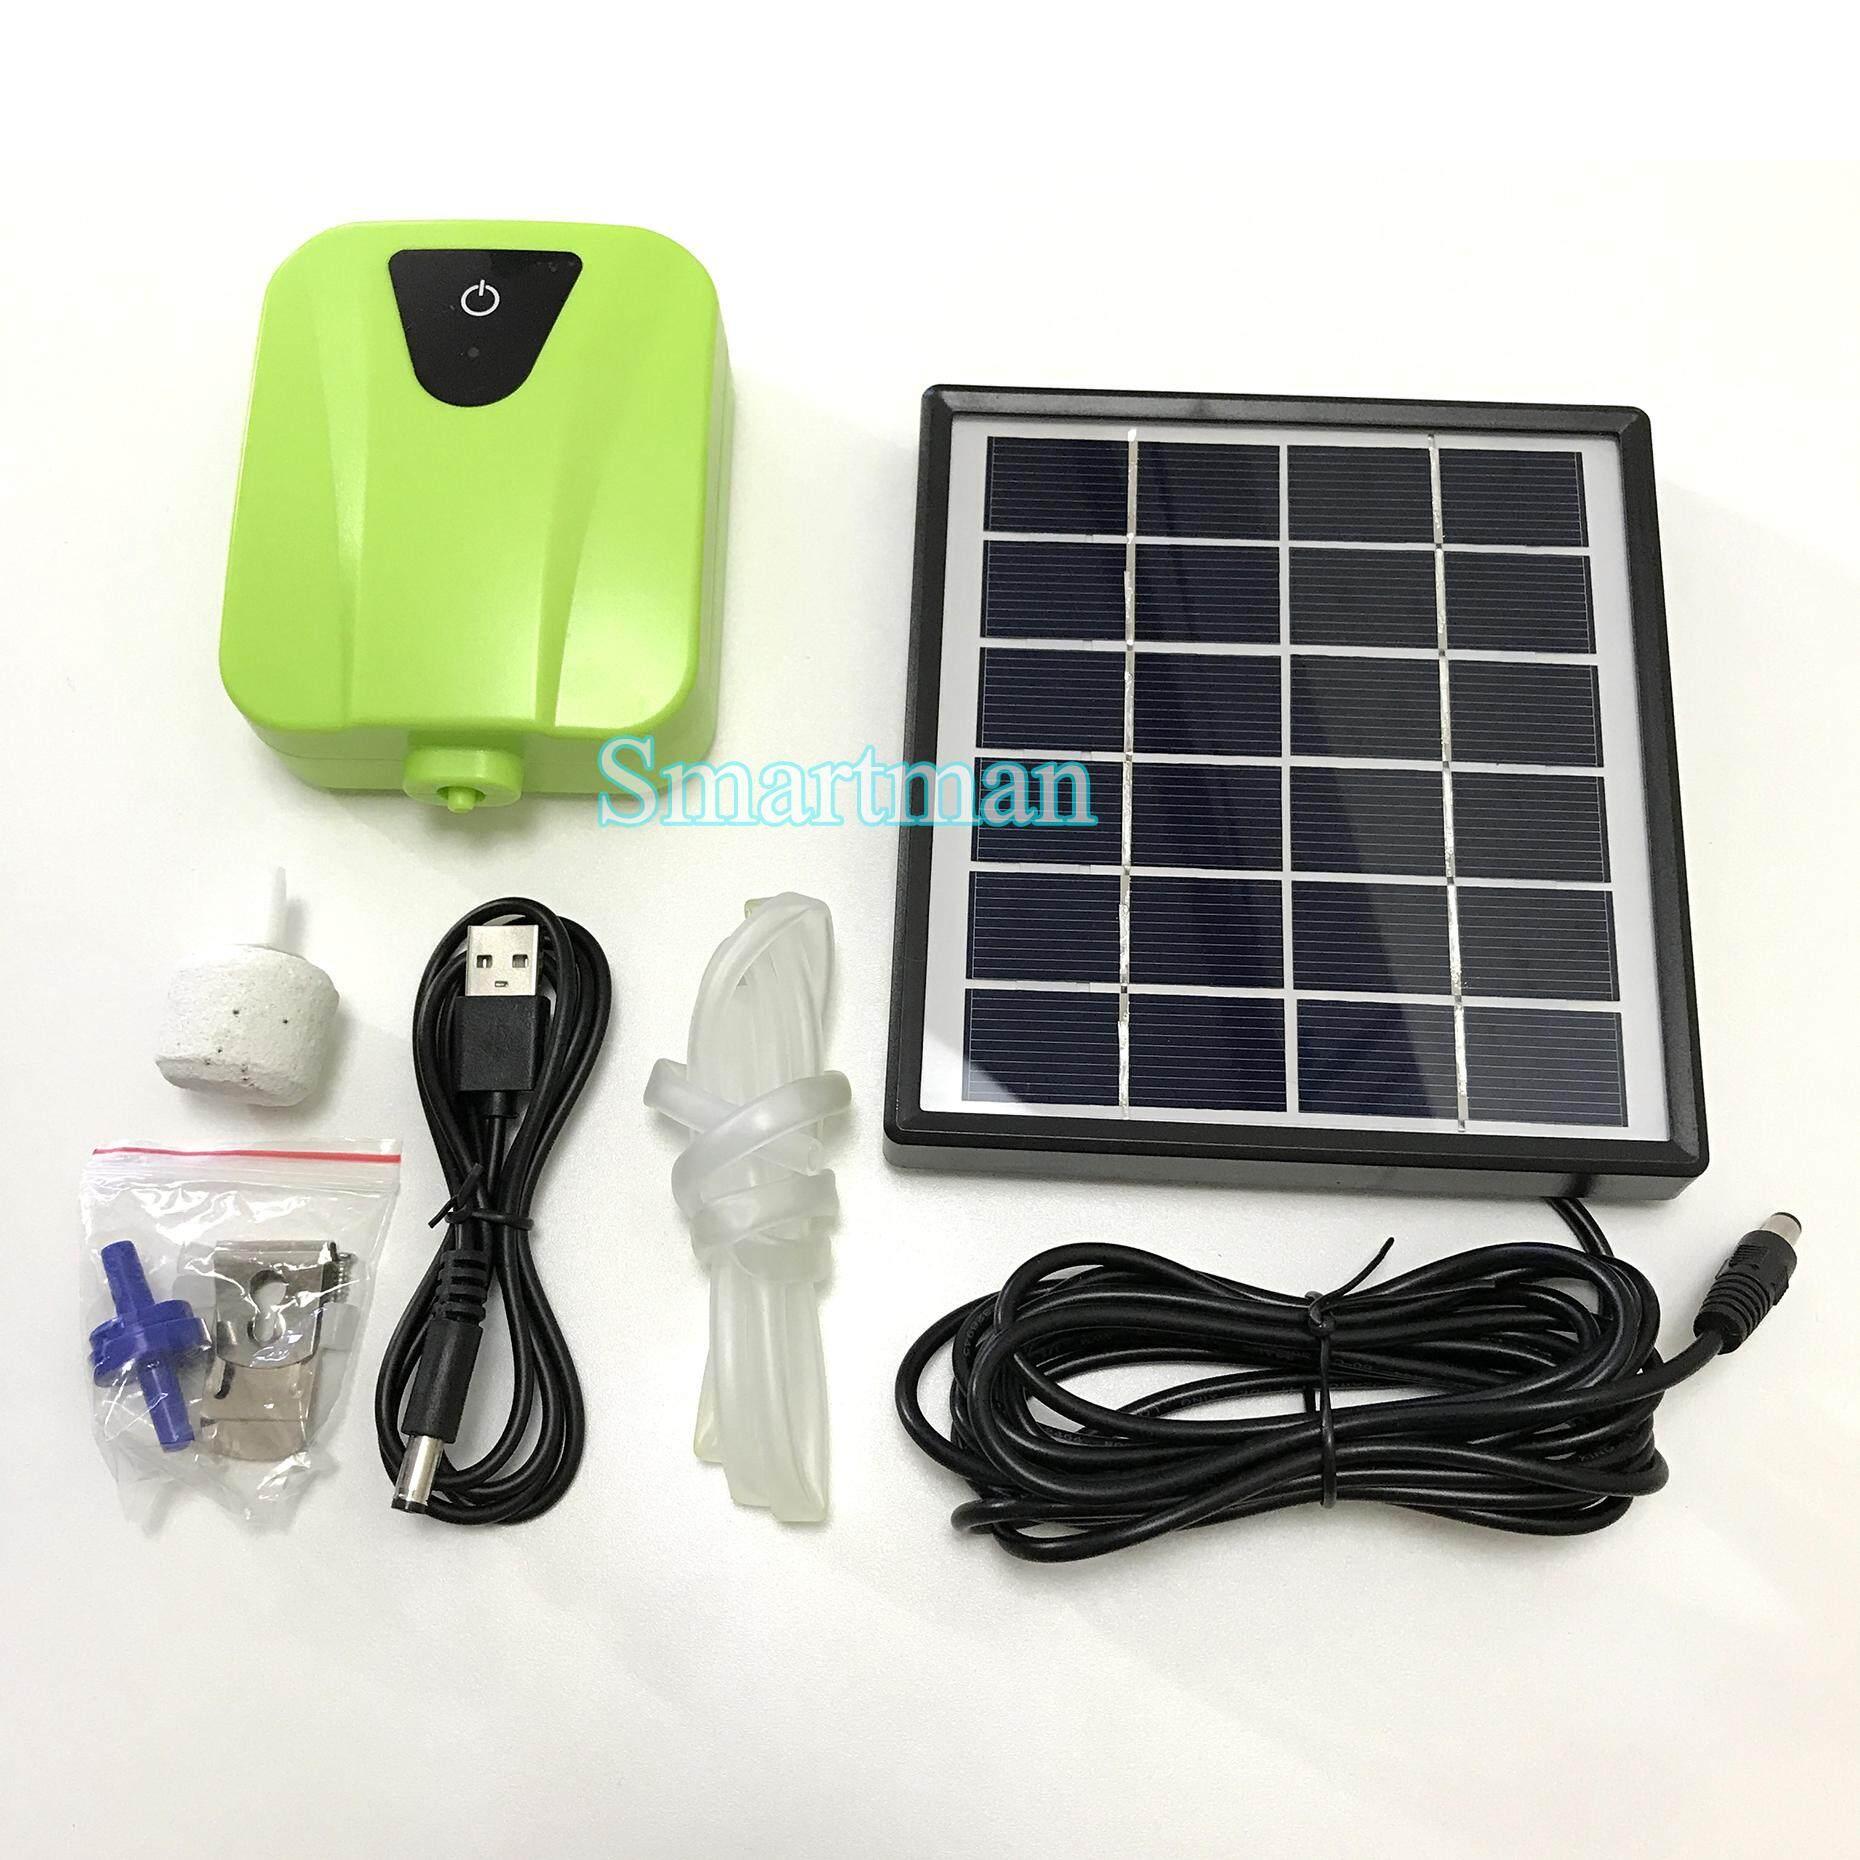 Image 2 for Smartman-Solar Pumb 0.5w ปั๊มออกซิเจน โซล่าเซลล์ 0.5 วัตต์